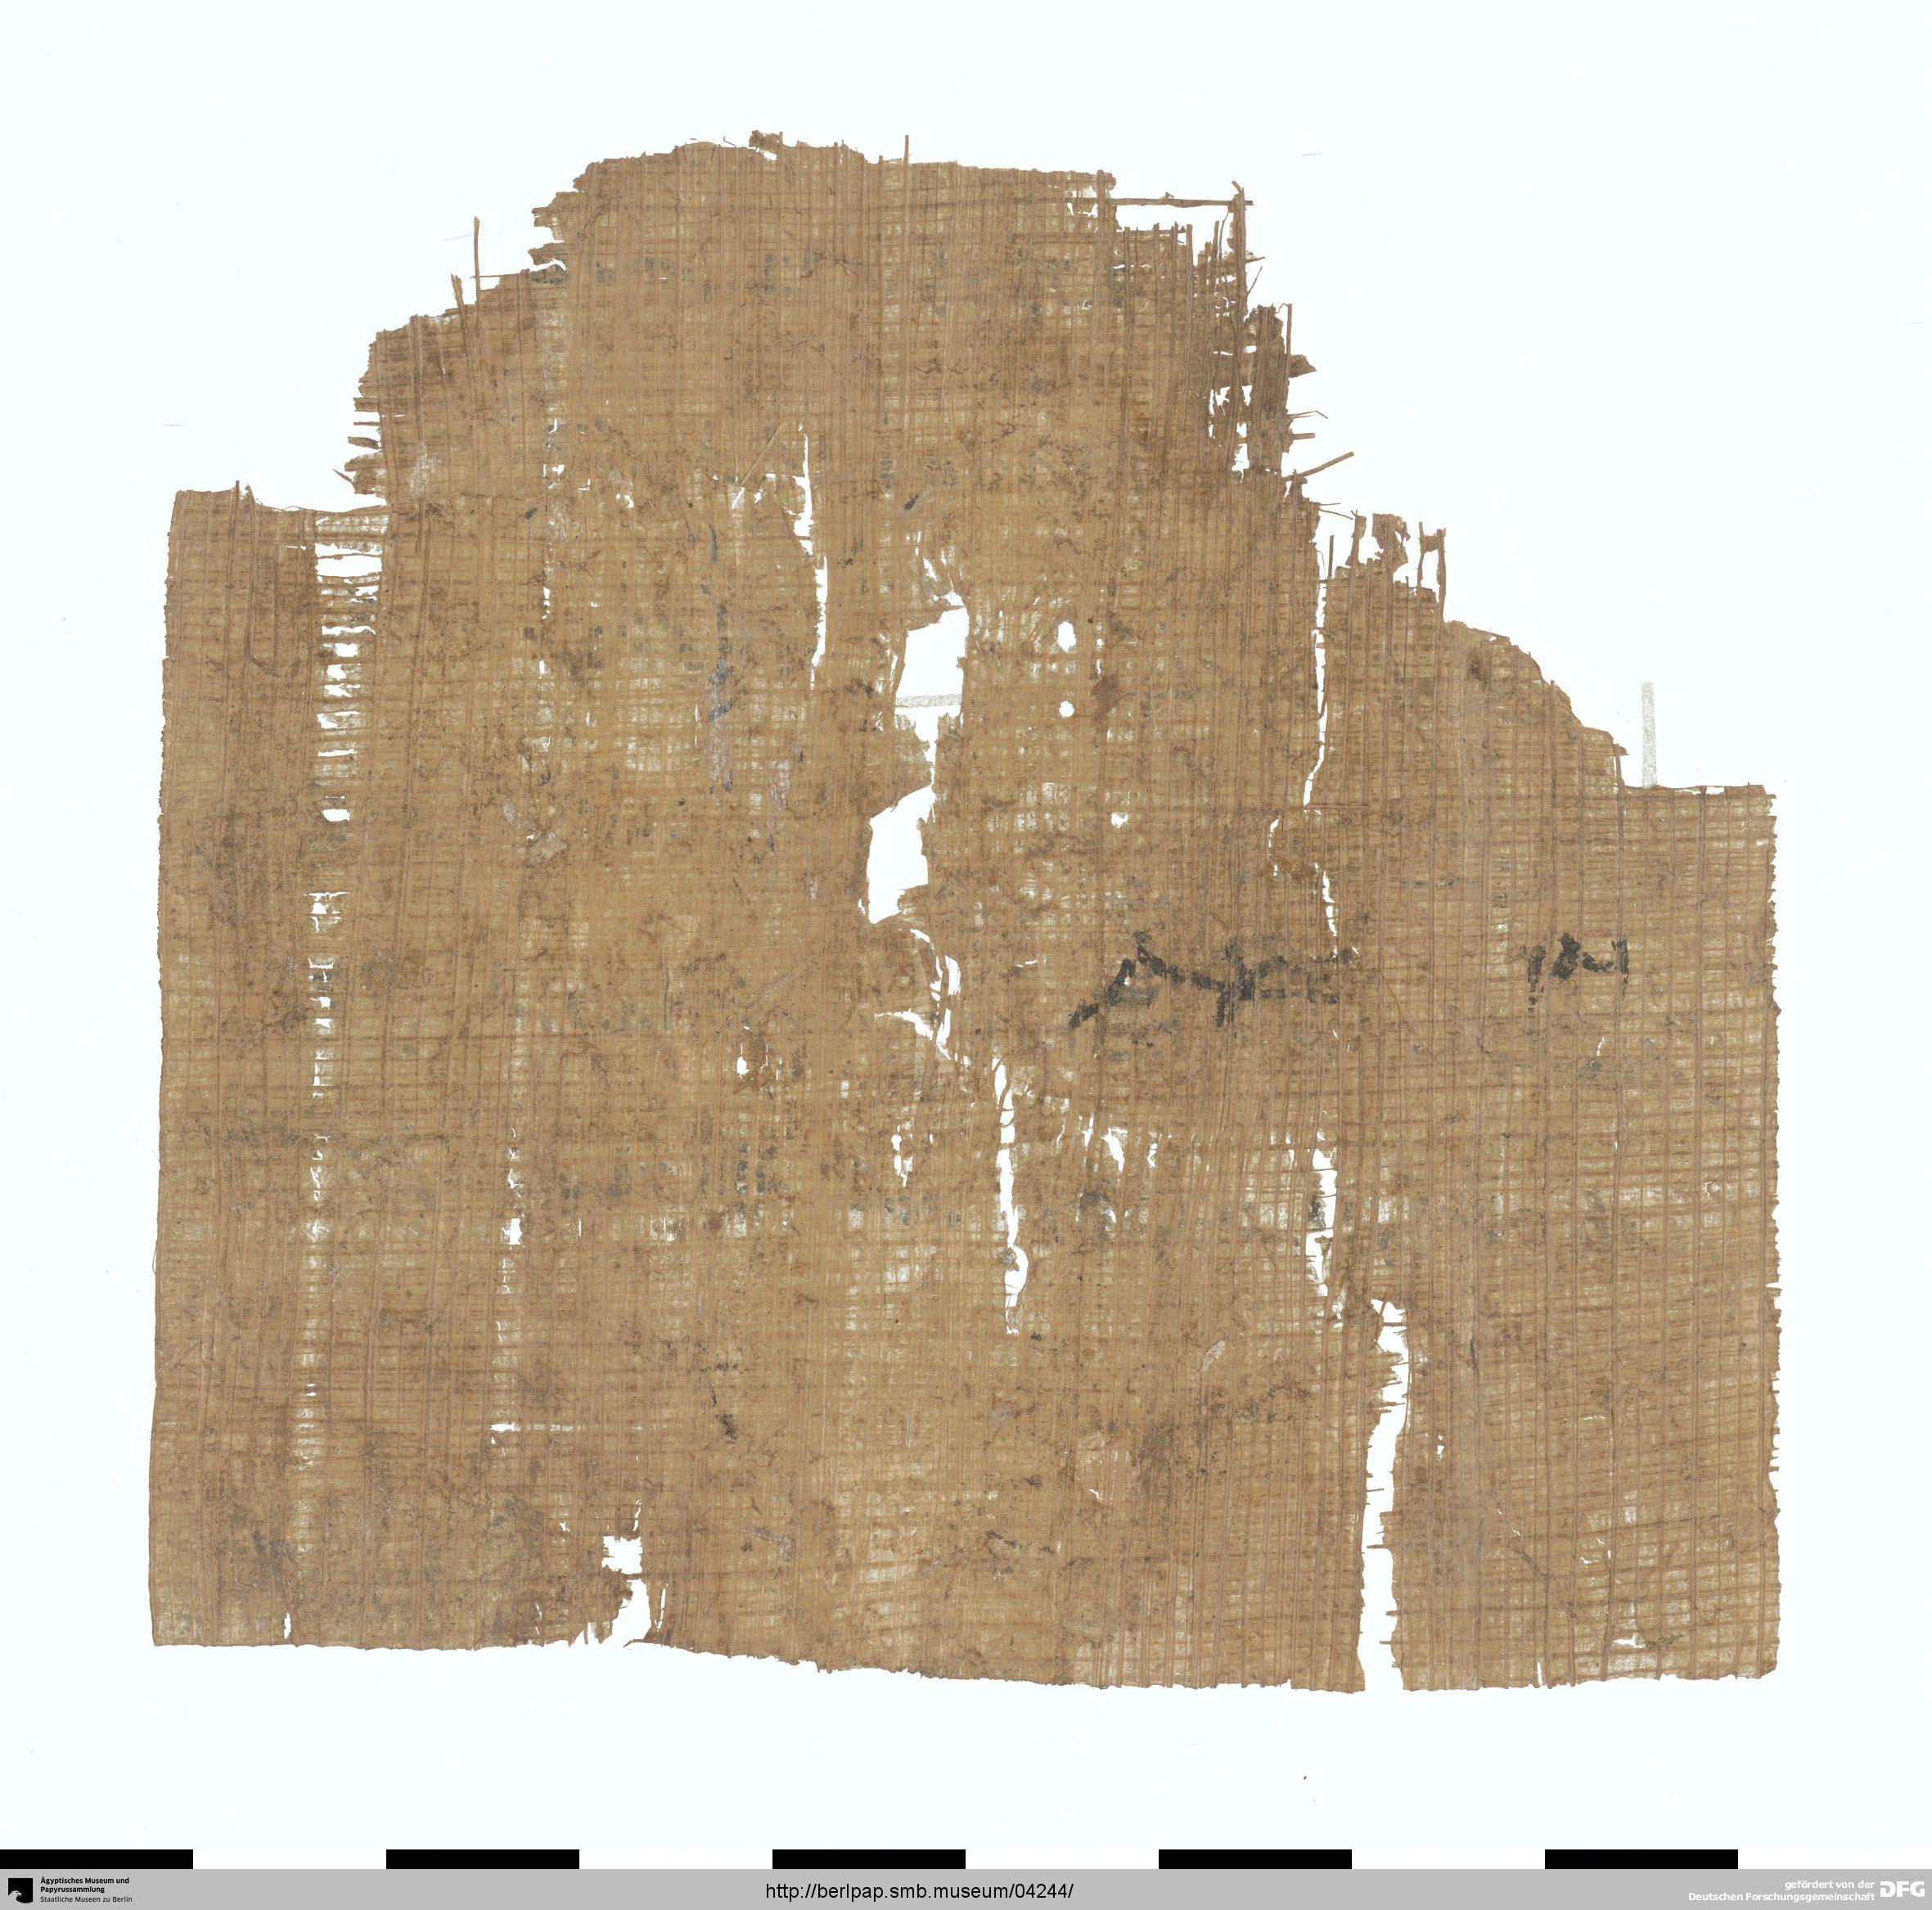 Hgv Amtlicher Brief